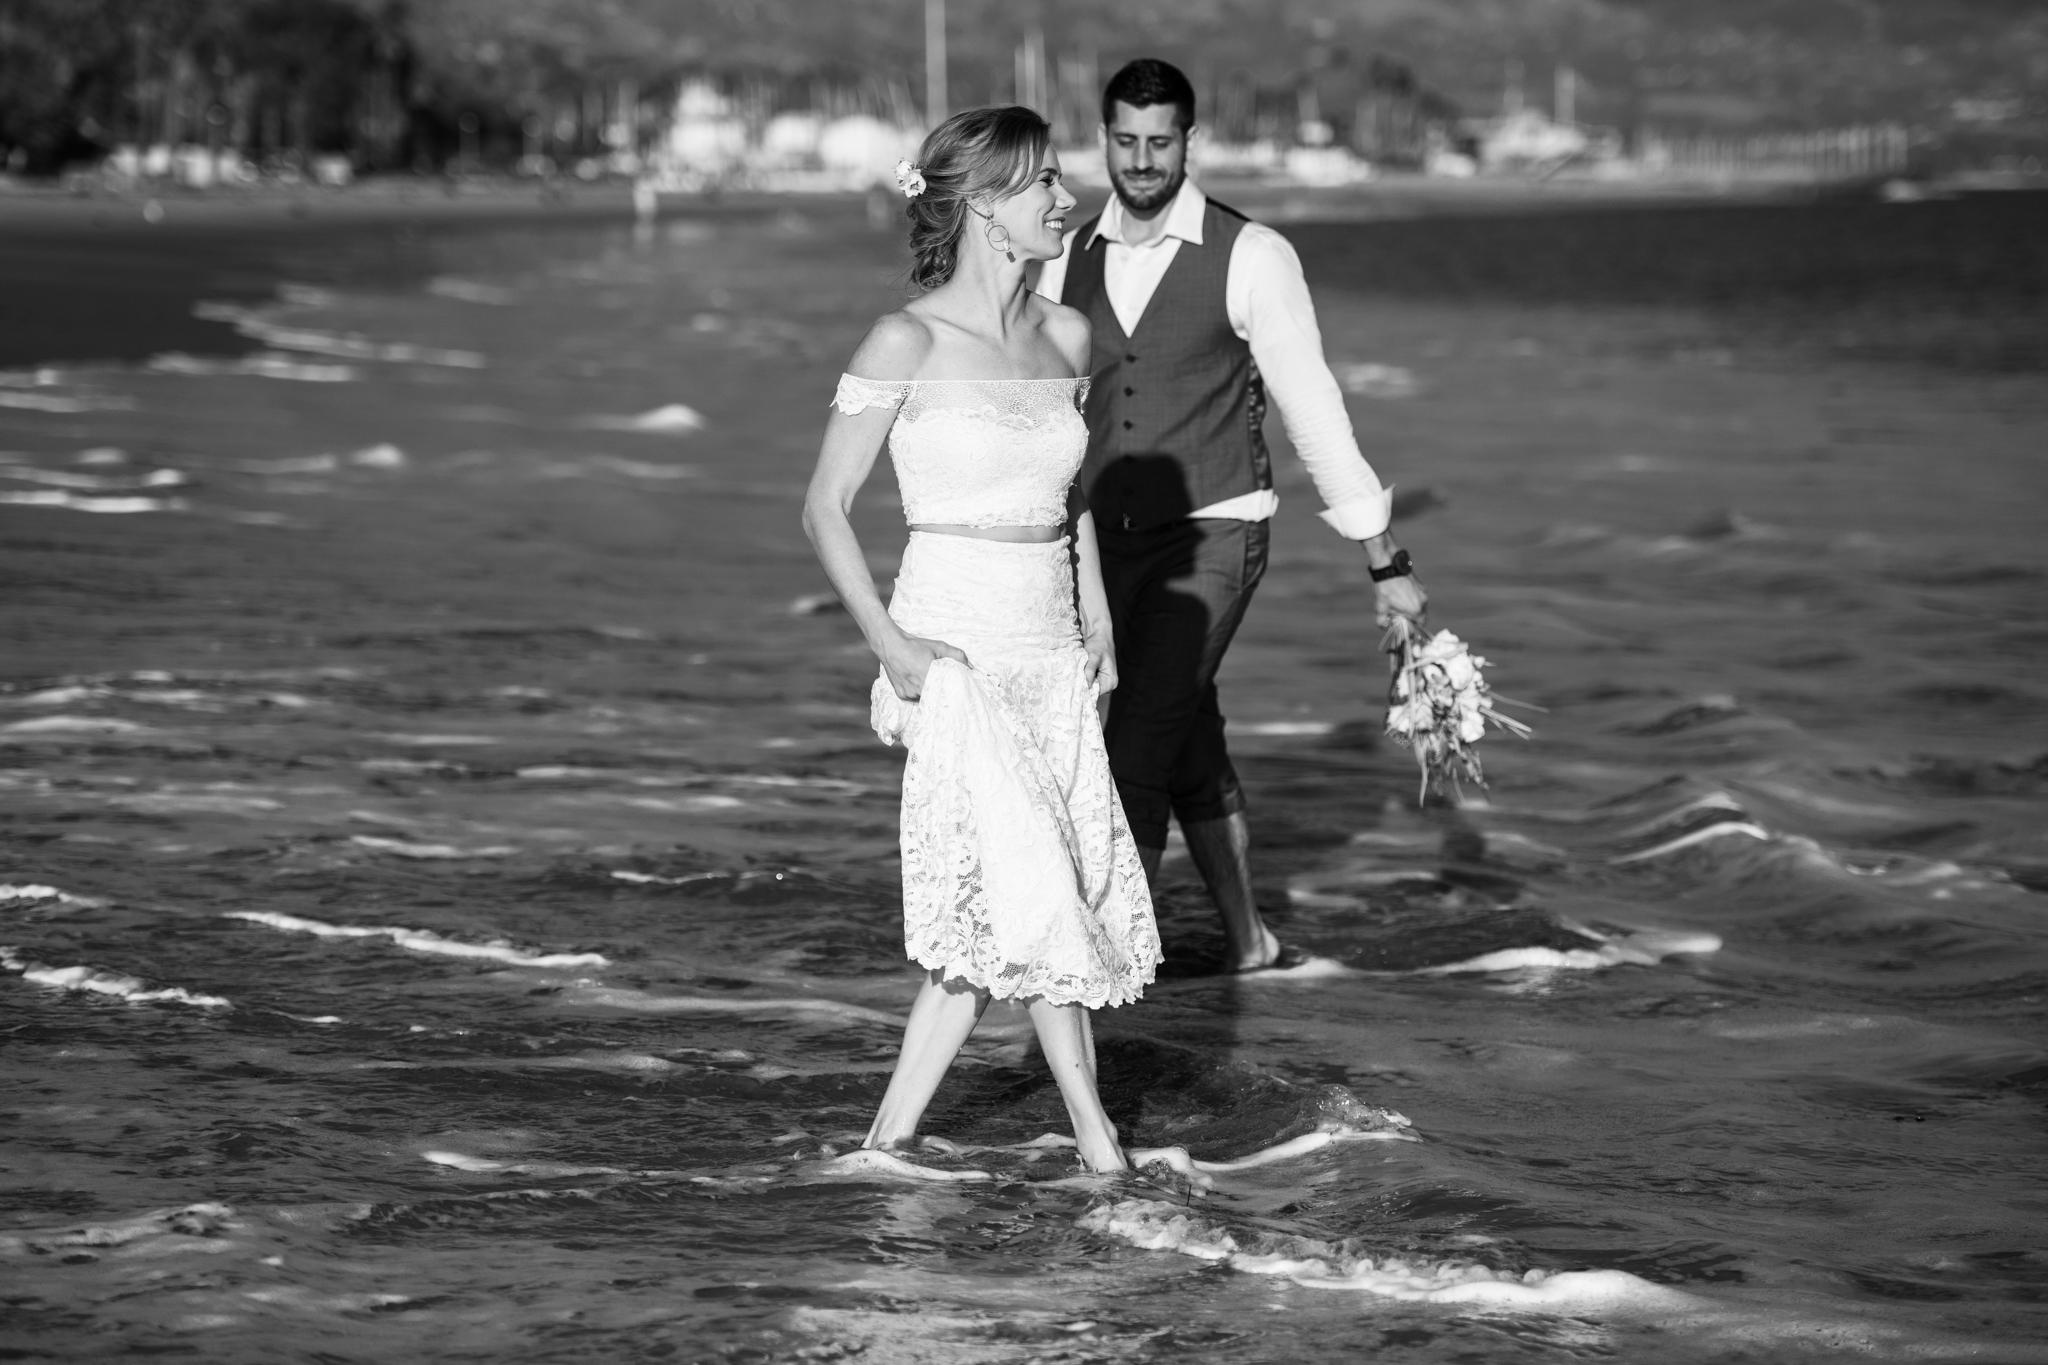 64_PRVW_Jenny_Ken_Wedding_Trevor_Hooper_Photo.jpg